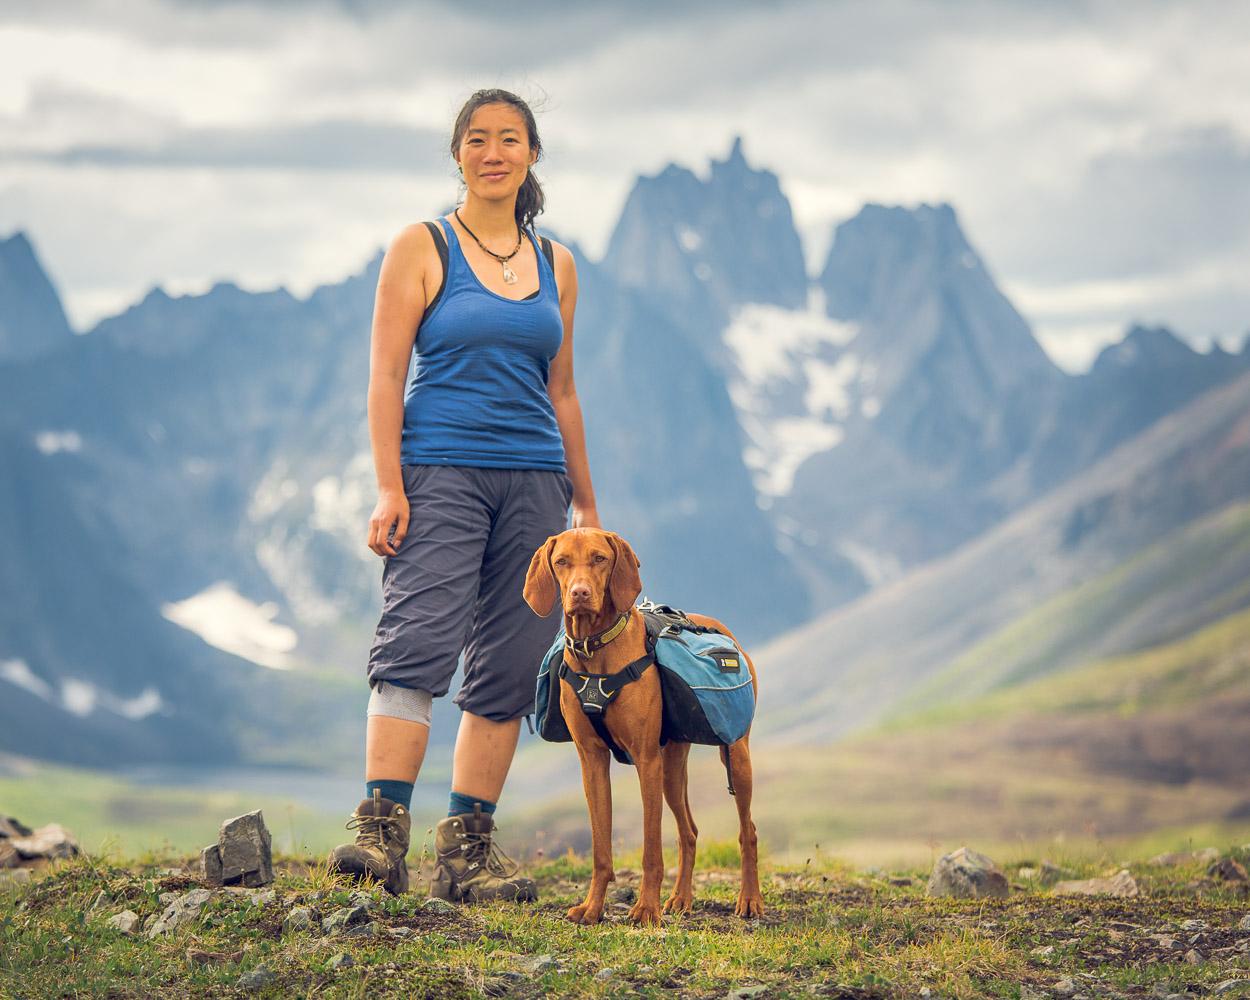 Tombstone, grizzly ridge lake trail